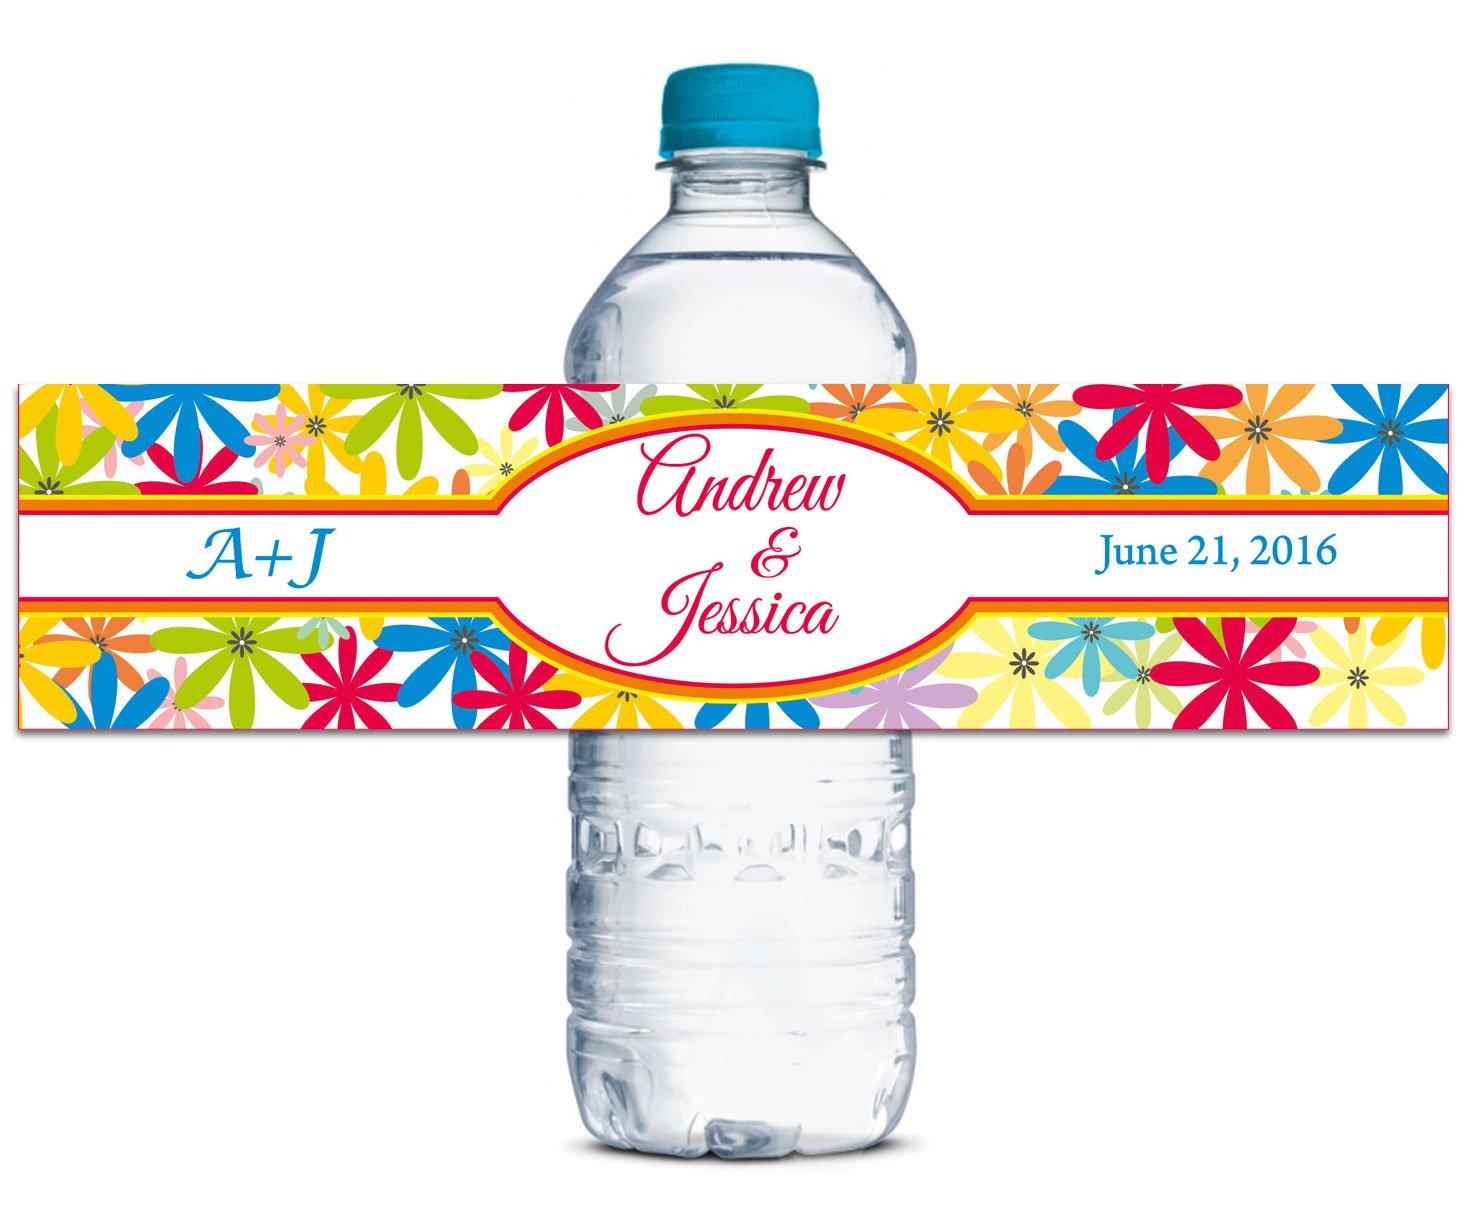 Custom Wedding Water Bottle Bottle Bottle Labels Floral Wedding Stickers Self Waterproof Retro 8  x 2  Inches - 60 Labels B013UV8PQG | Gute Qualität  06e9a8